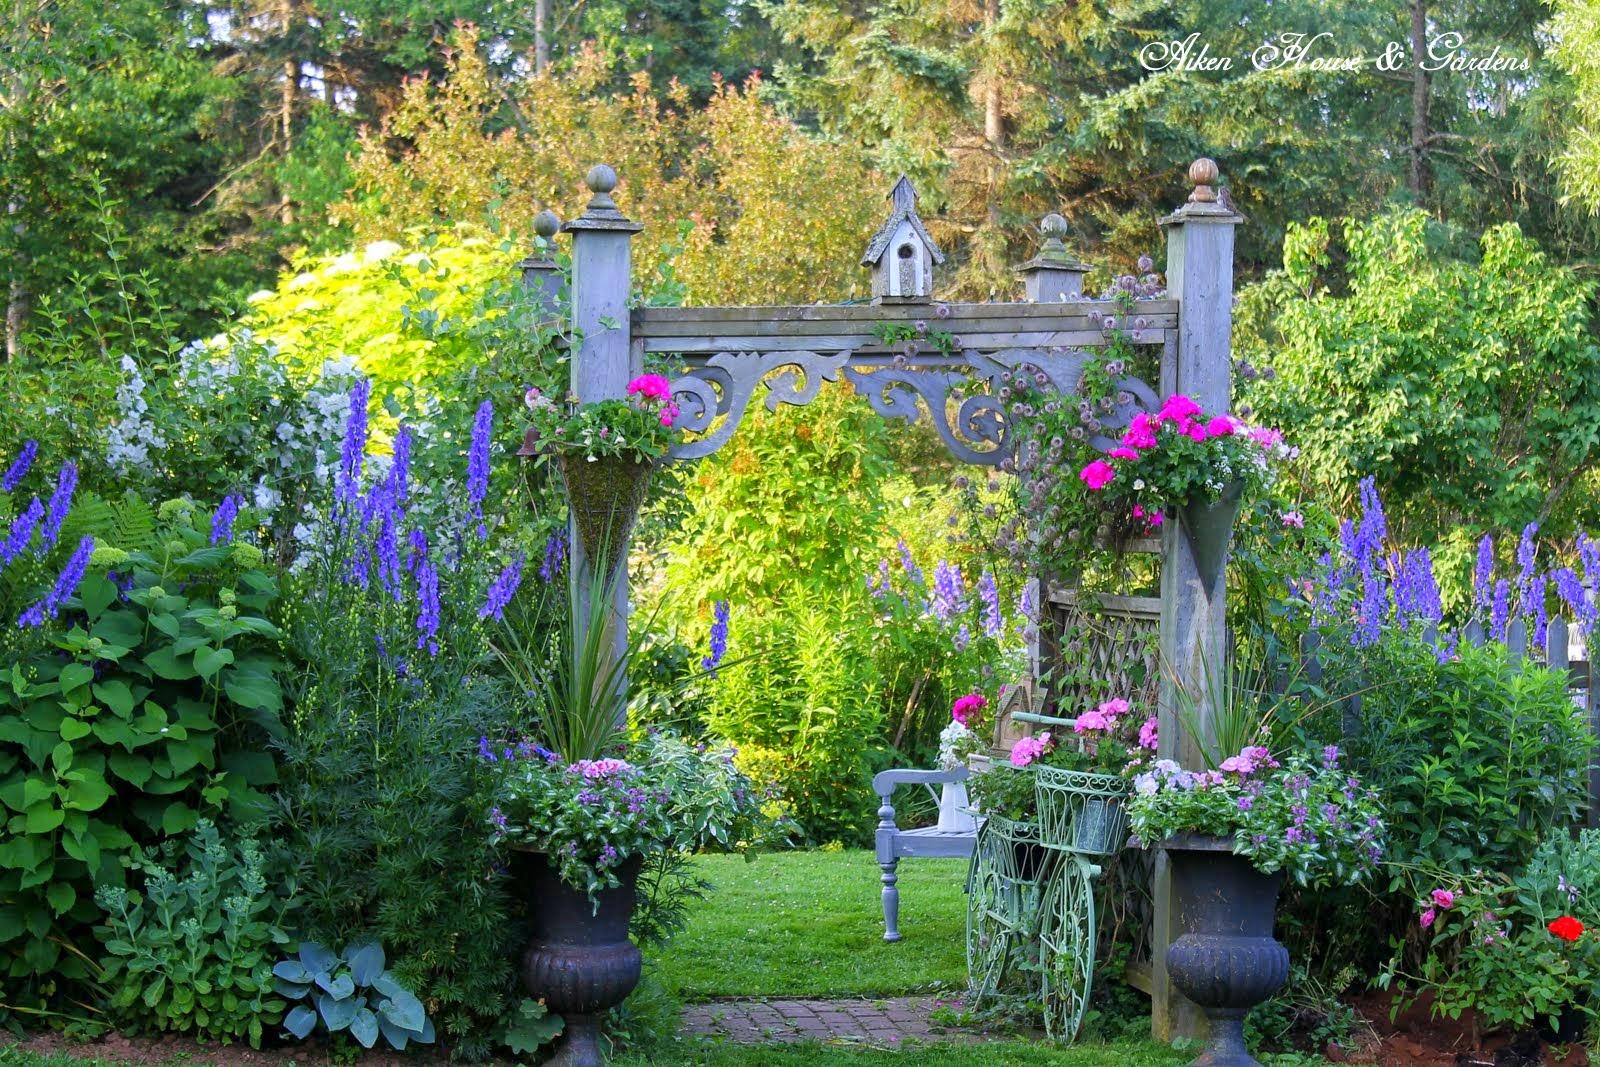 Aiken house gardens garden dreams for Aiken house